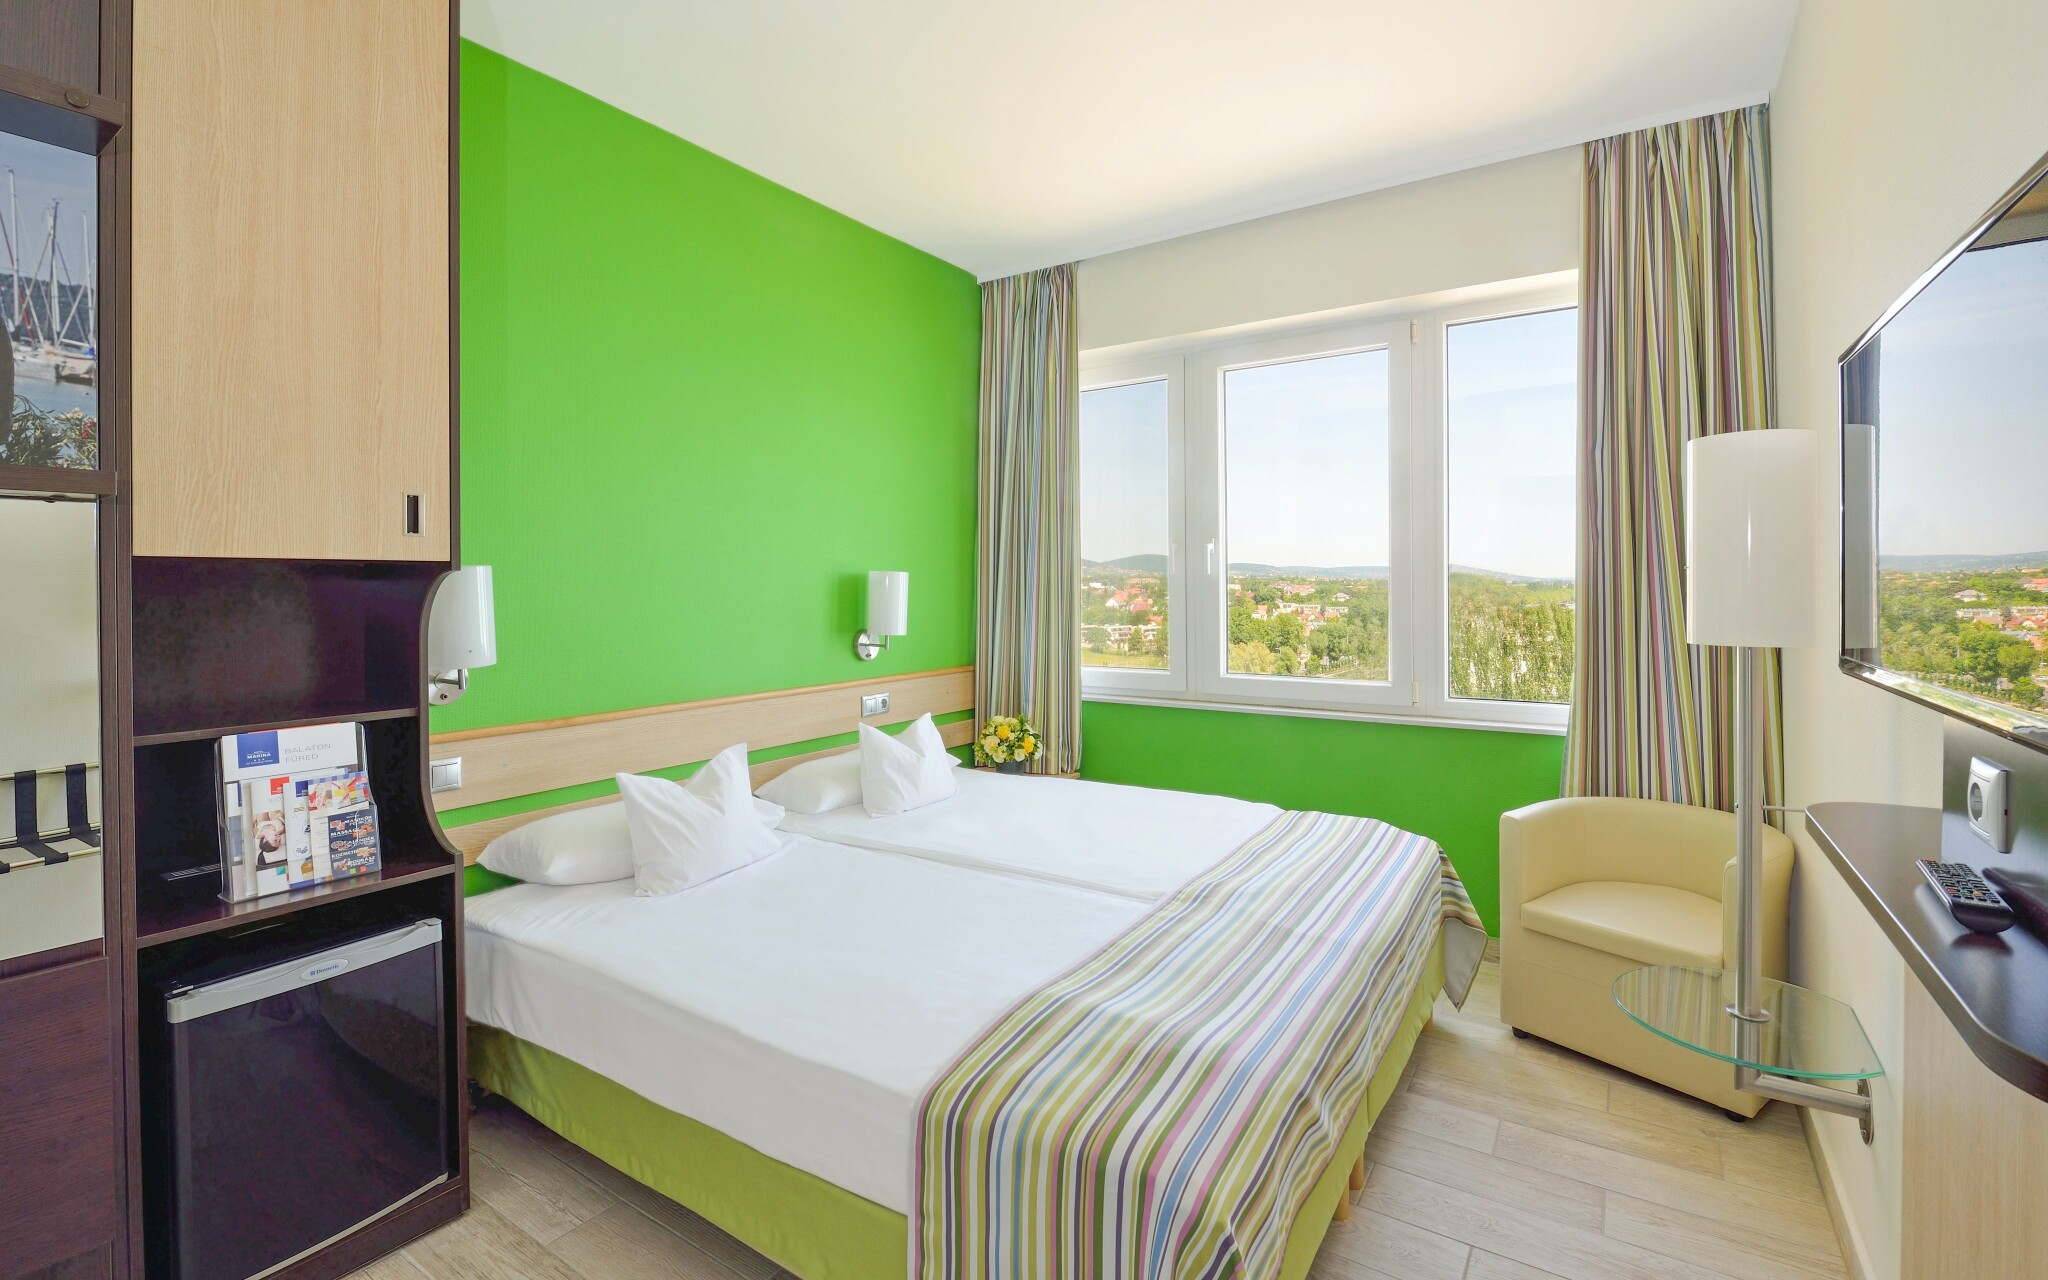 Izba Superior, Danubius Hotel Marina, Balatonfüred, Balaton